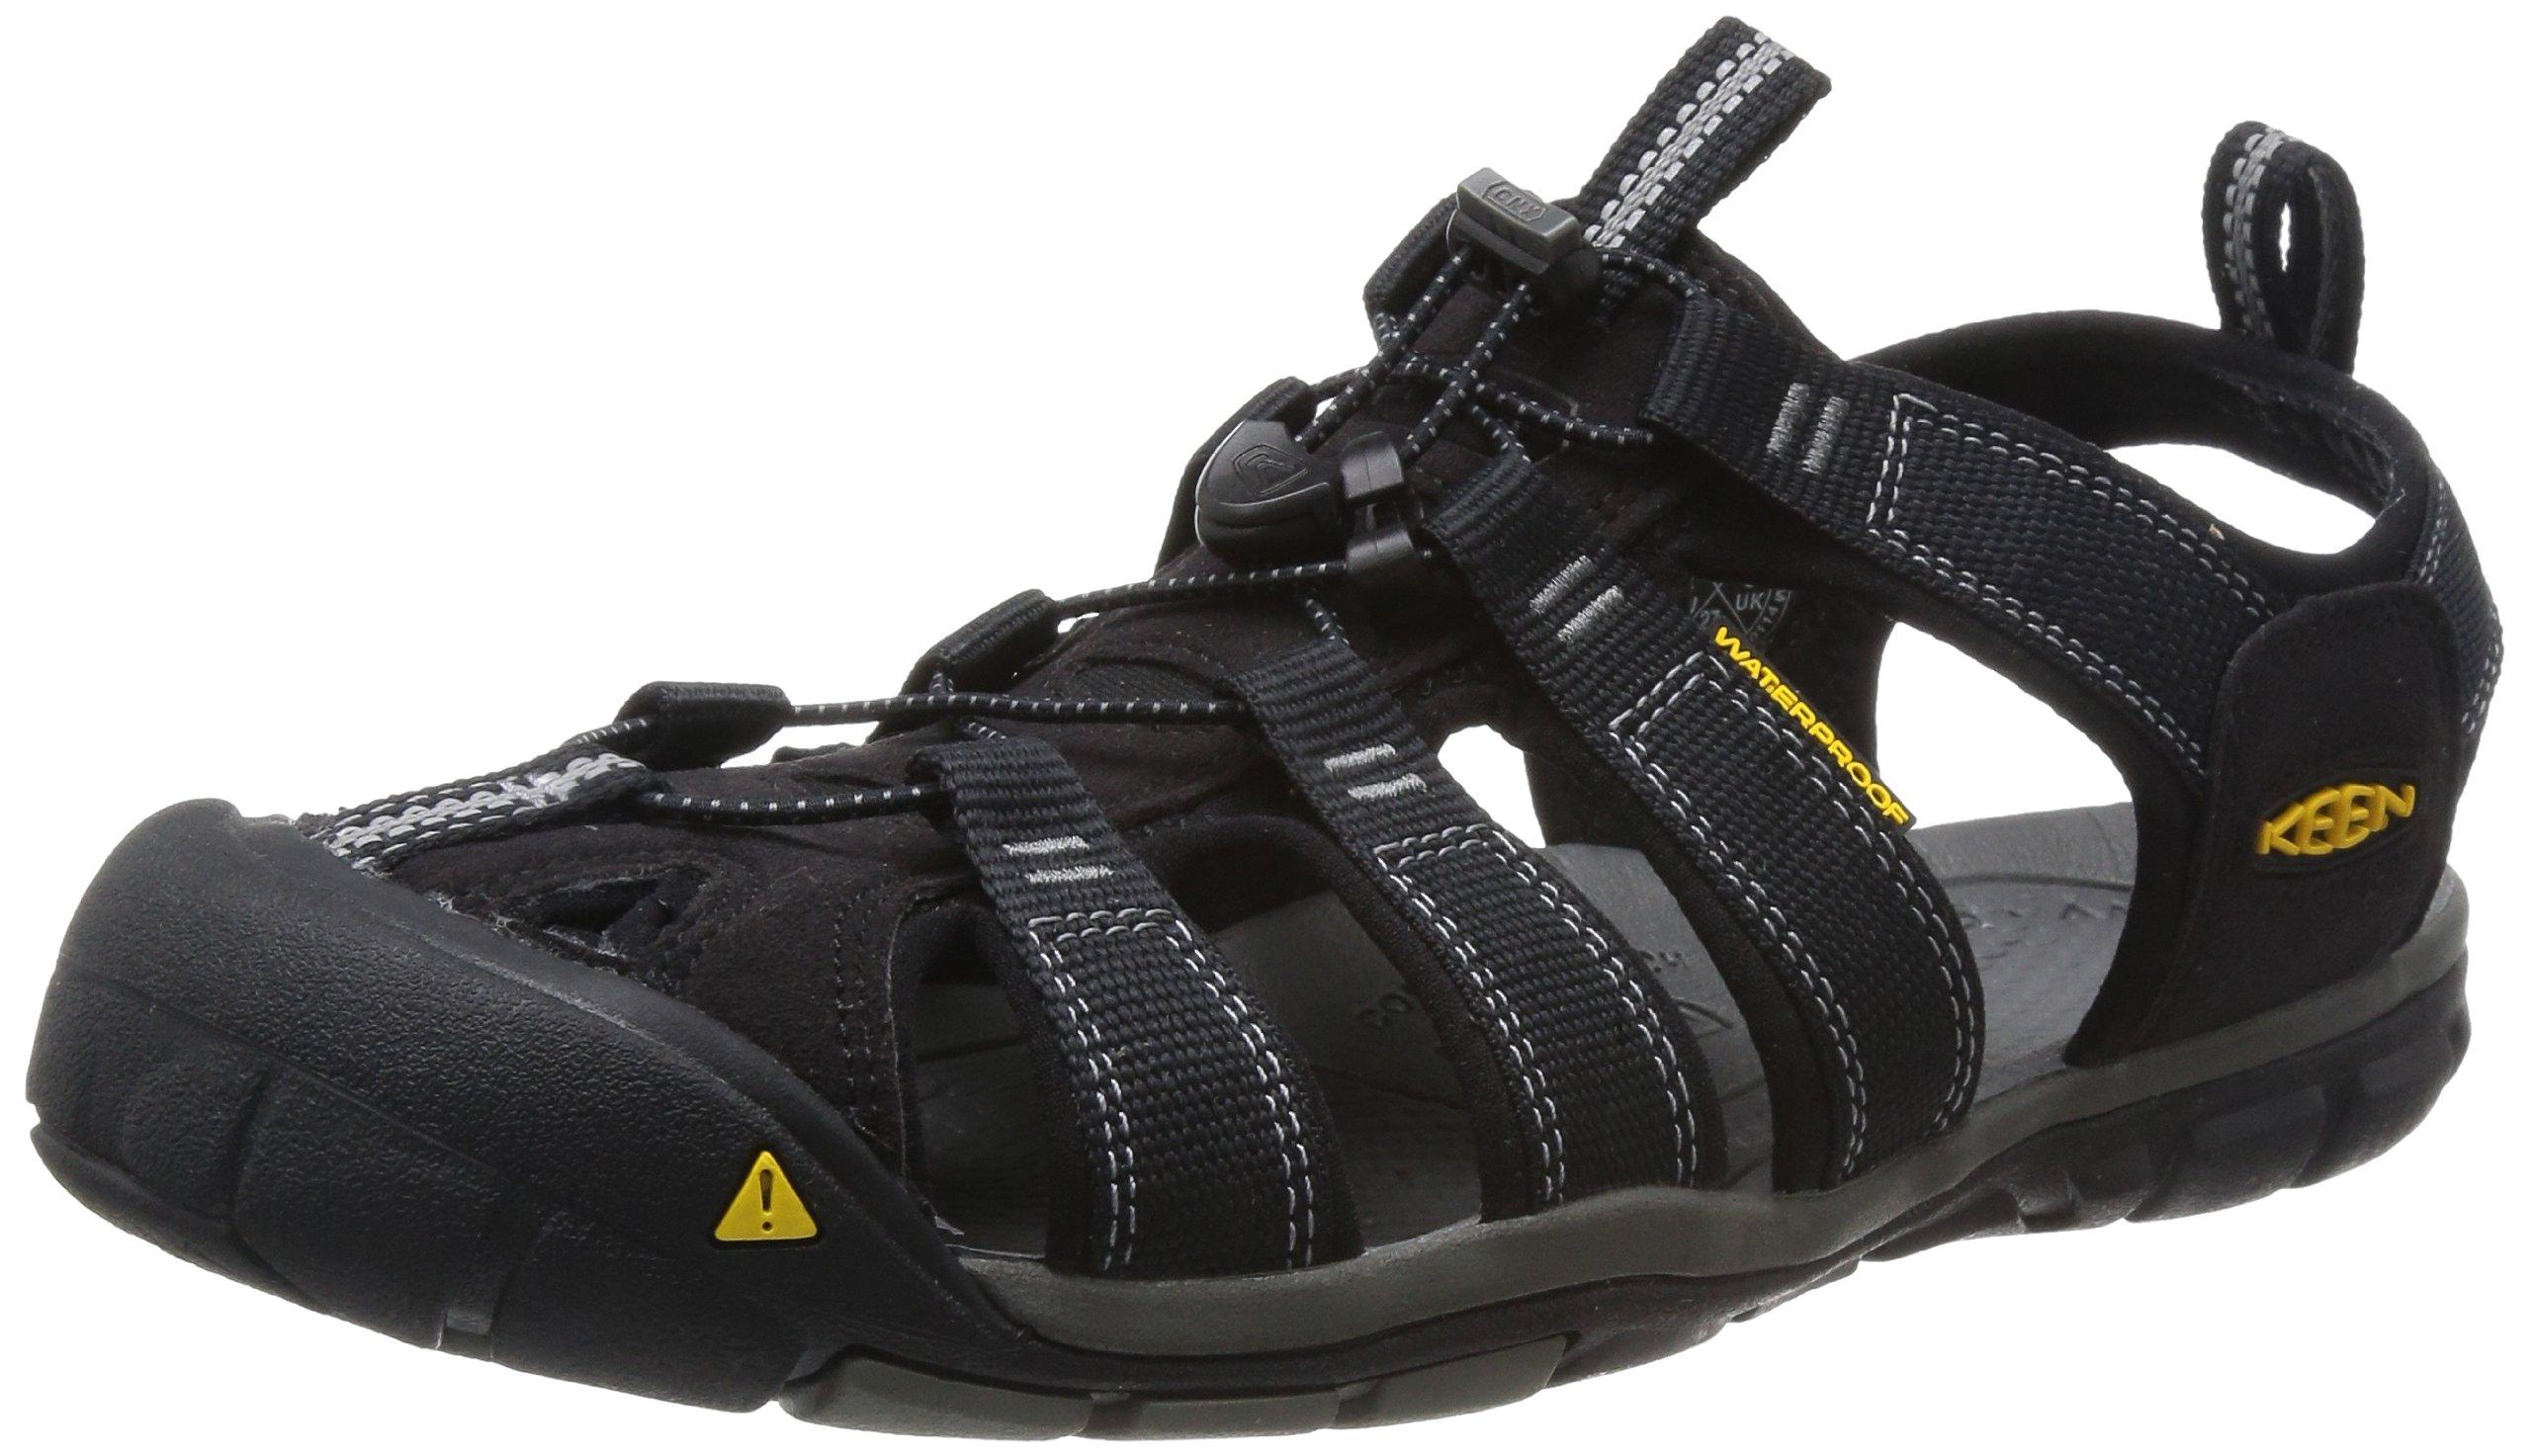 Keen Herren Clearwater Cnx Sandalen Trekking-& Wanderschuhe, Schwarz (Black/Garg